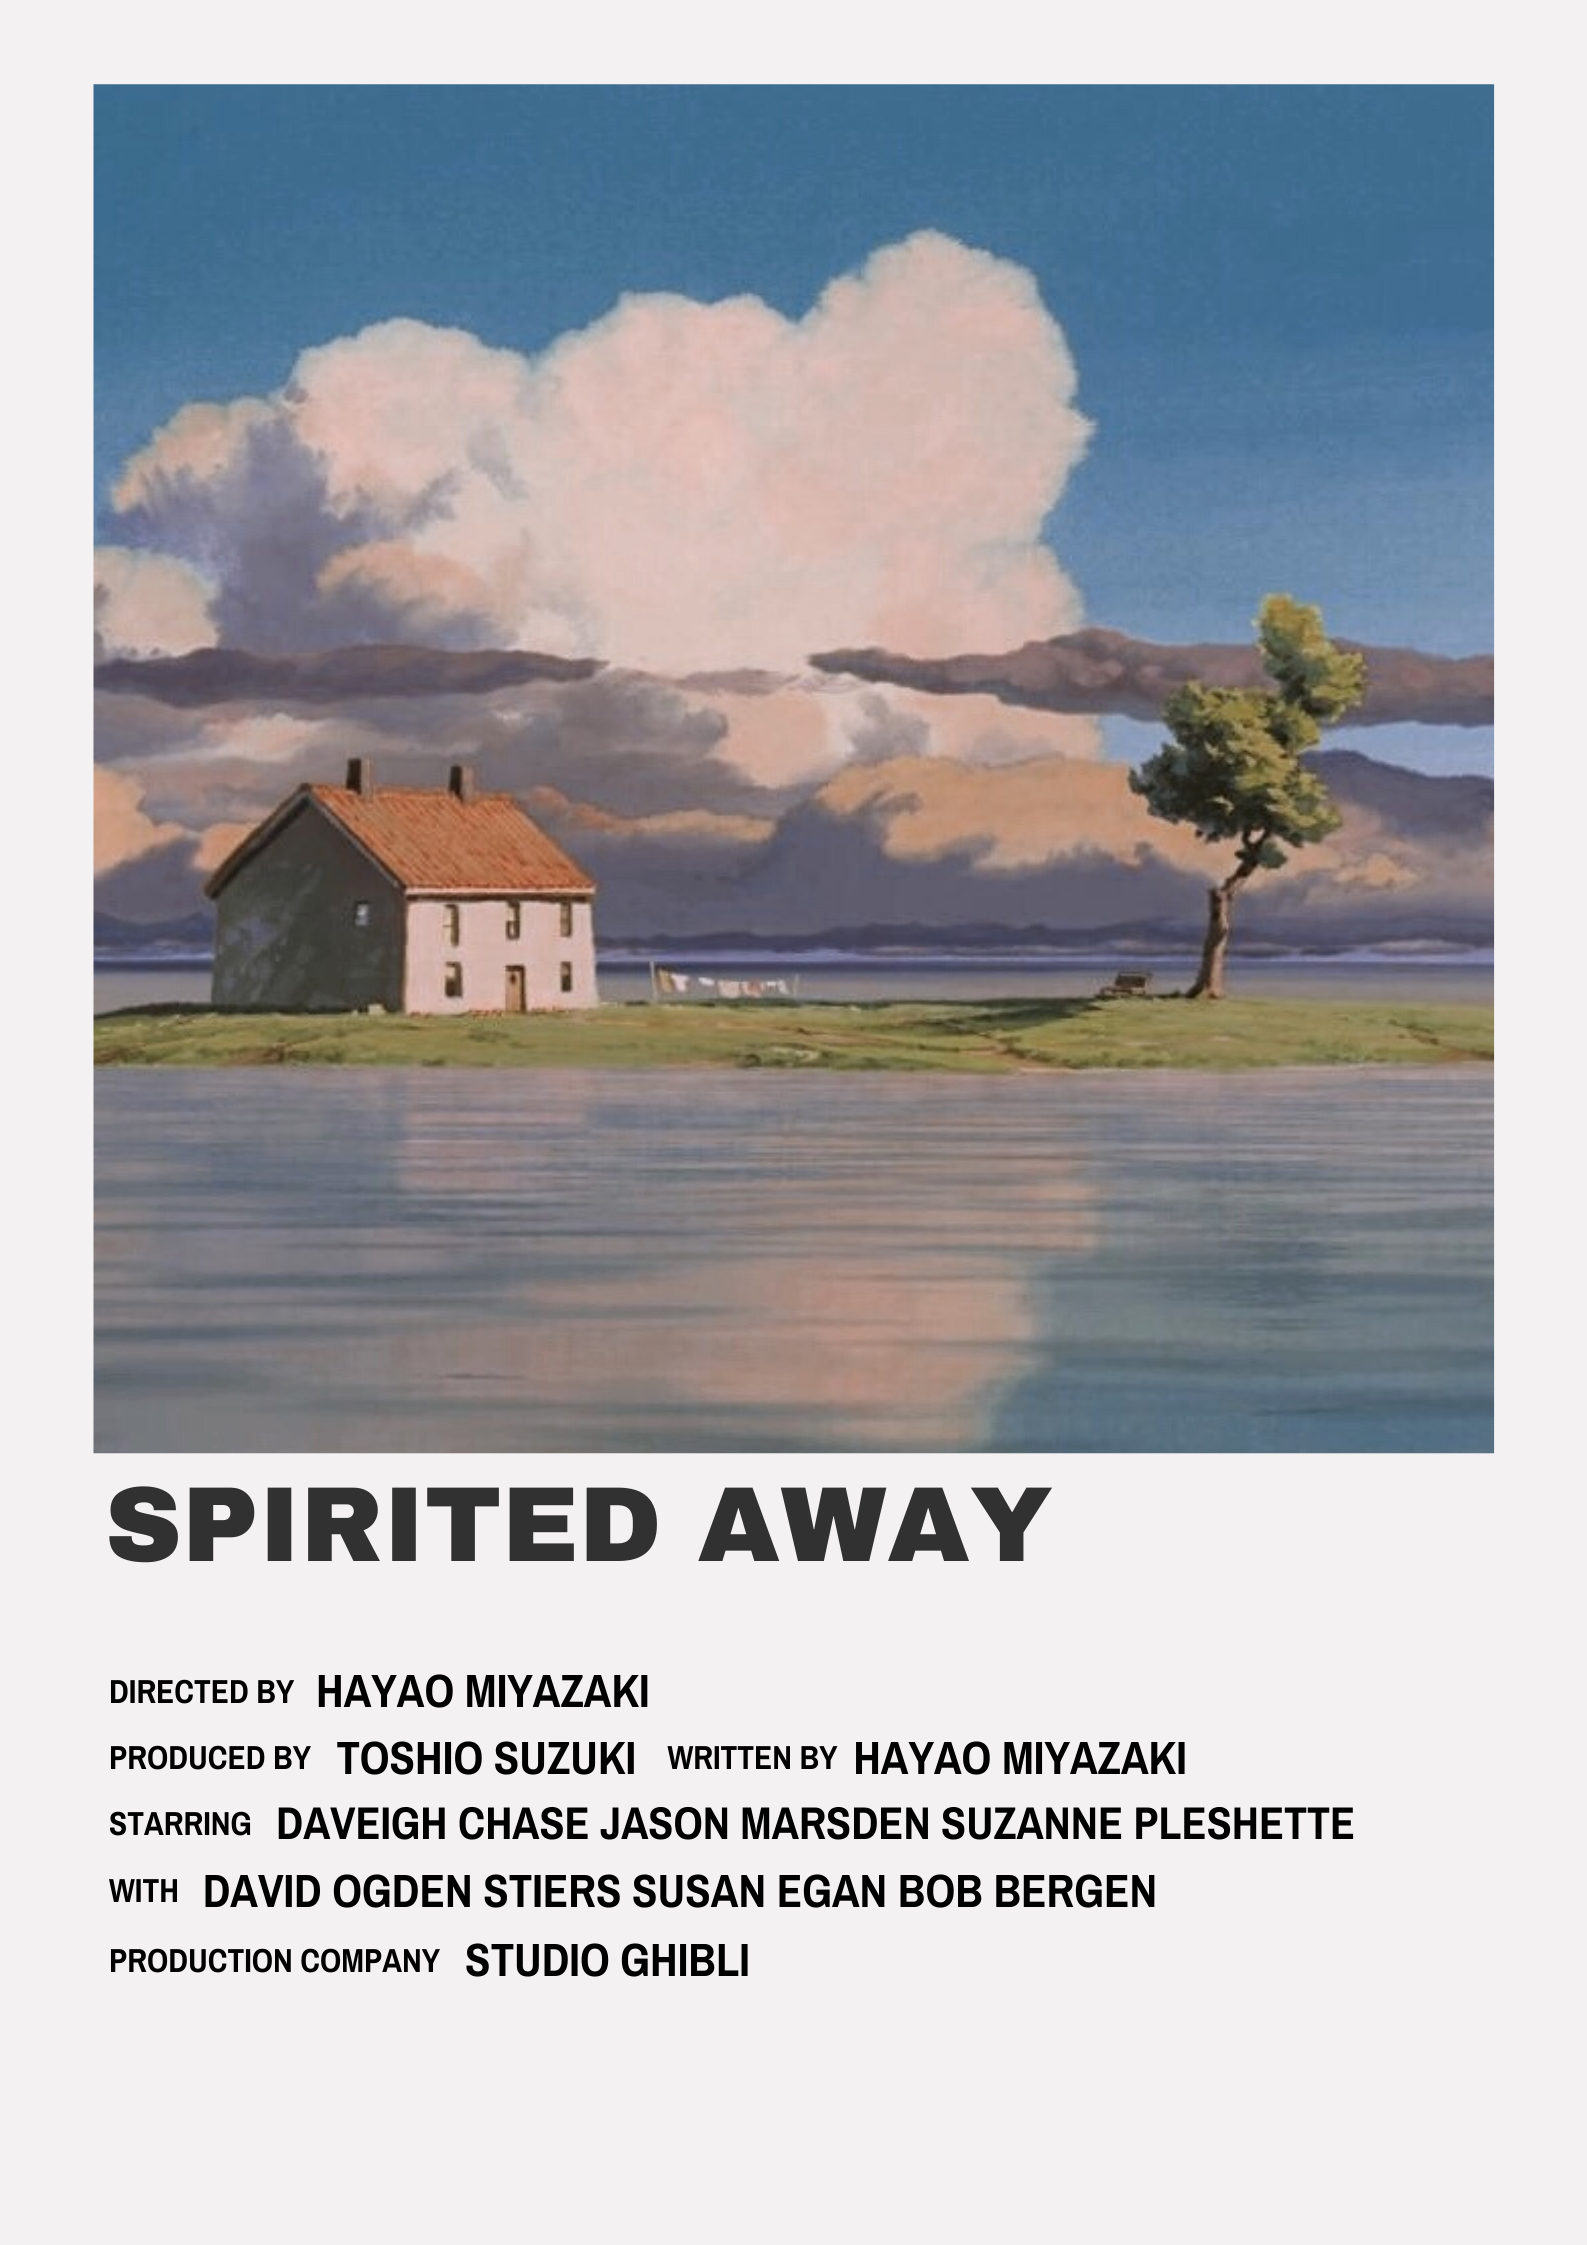 Spirited Away Minimalist Film Poster | Studio ghibli ...